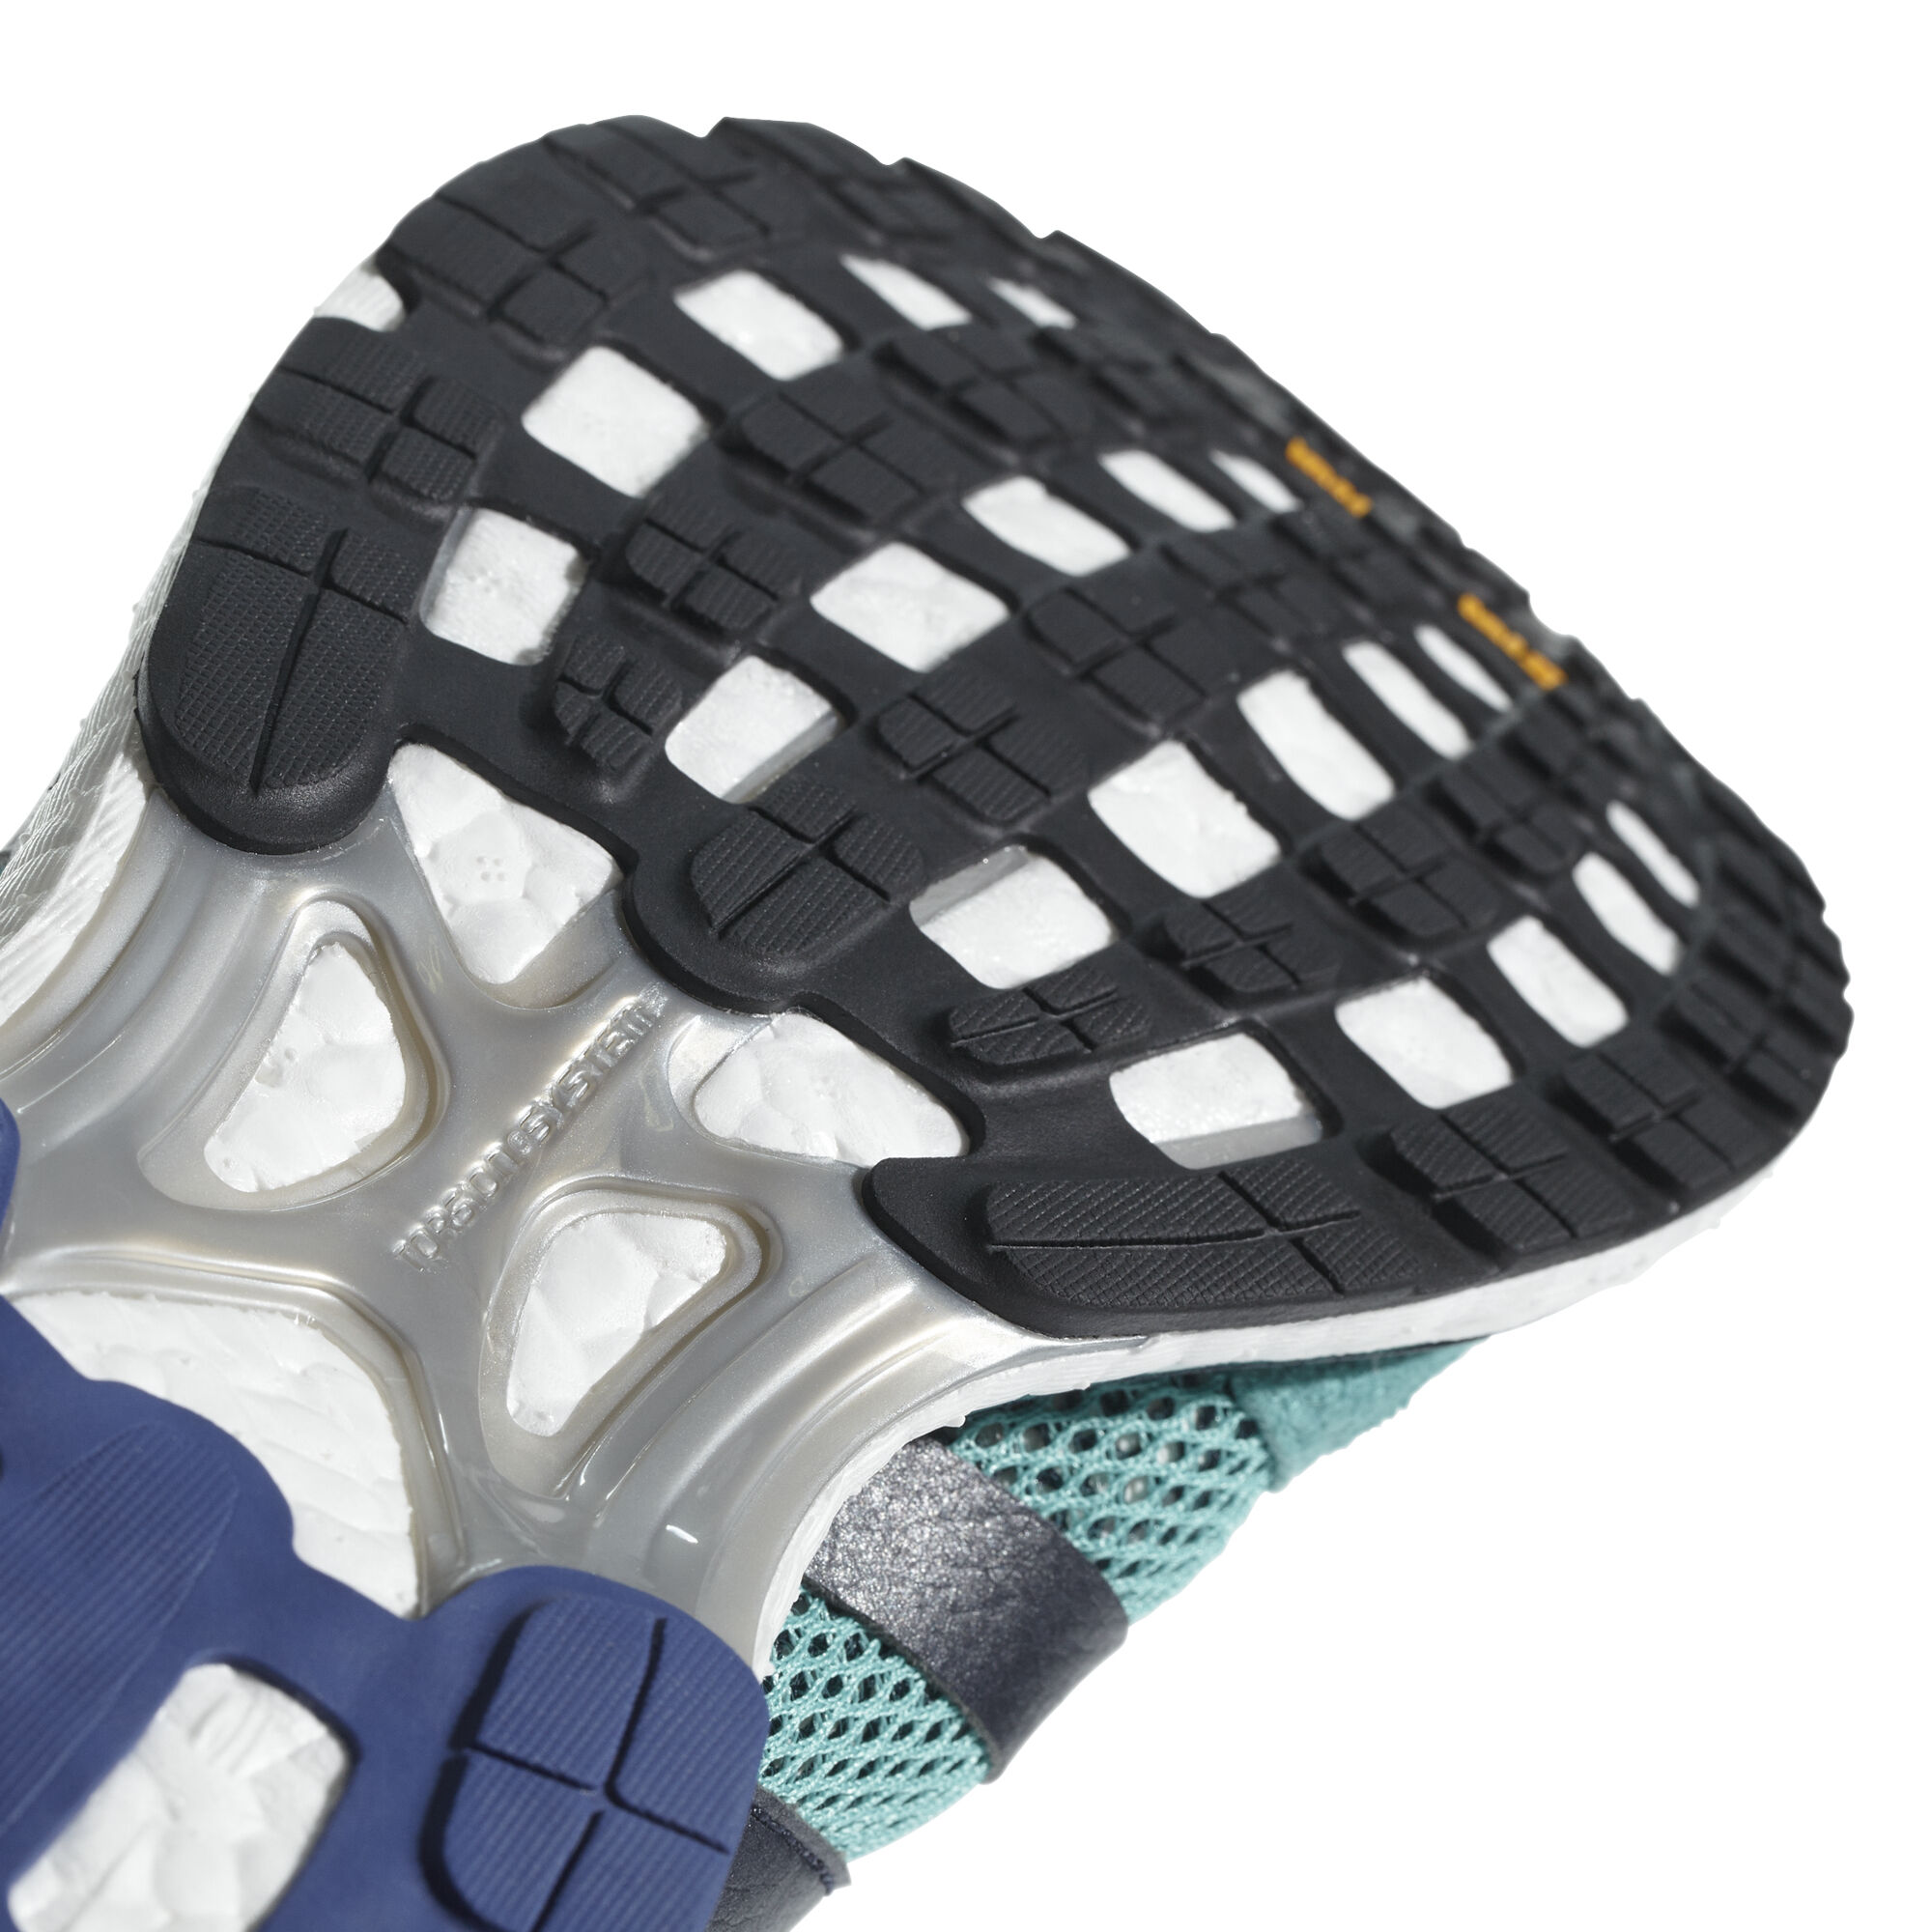 buy popular c00cc 0b76e adidas · adidas · adidas · adidas · adidas · adidas · adidas · adidas ·  adidas. Adizero Adios 3 ...